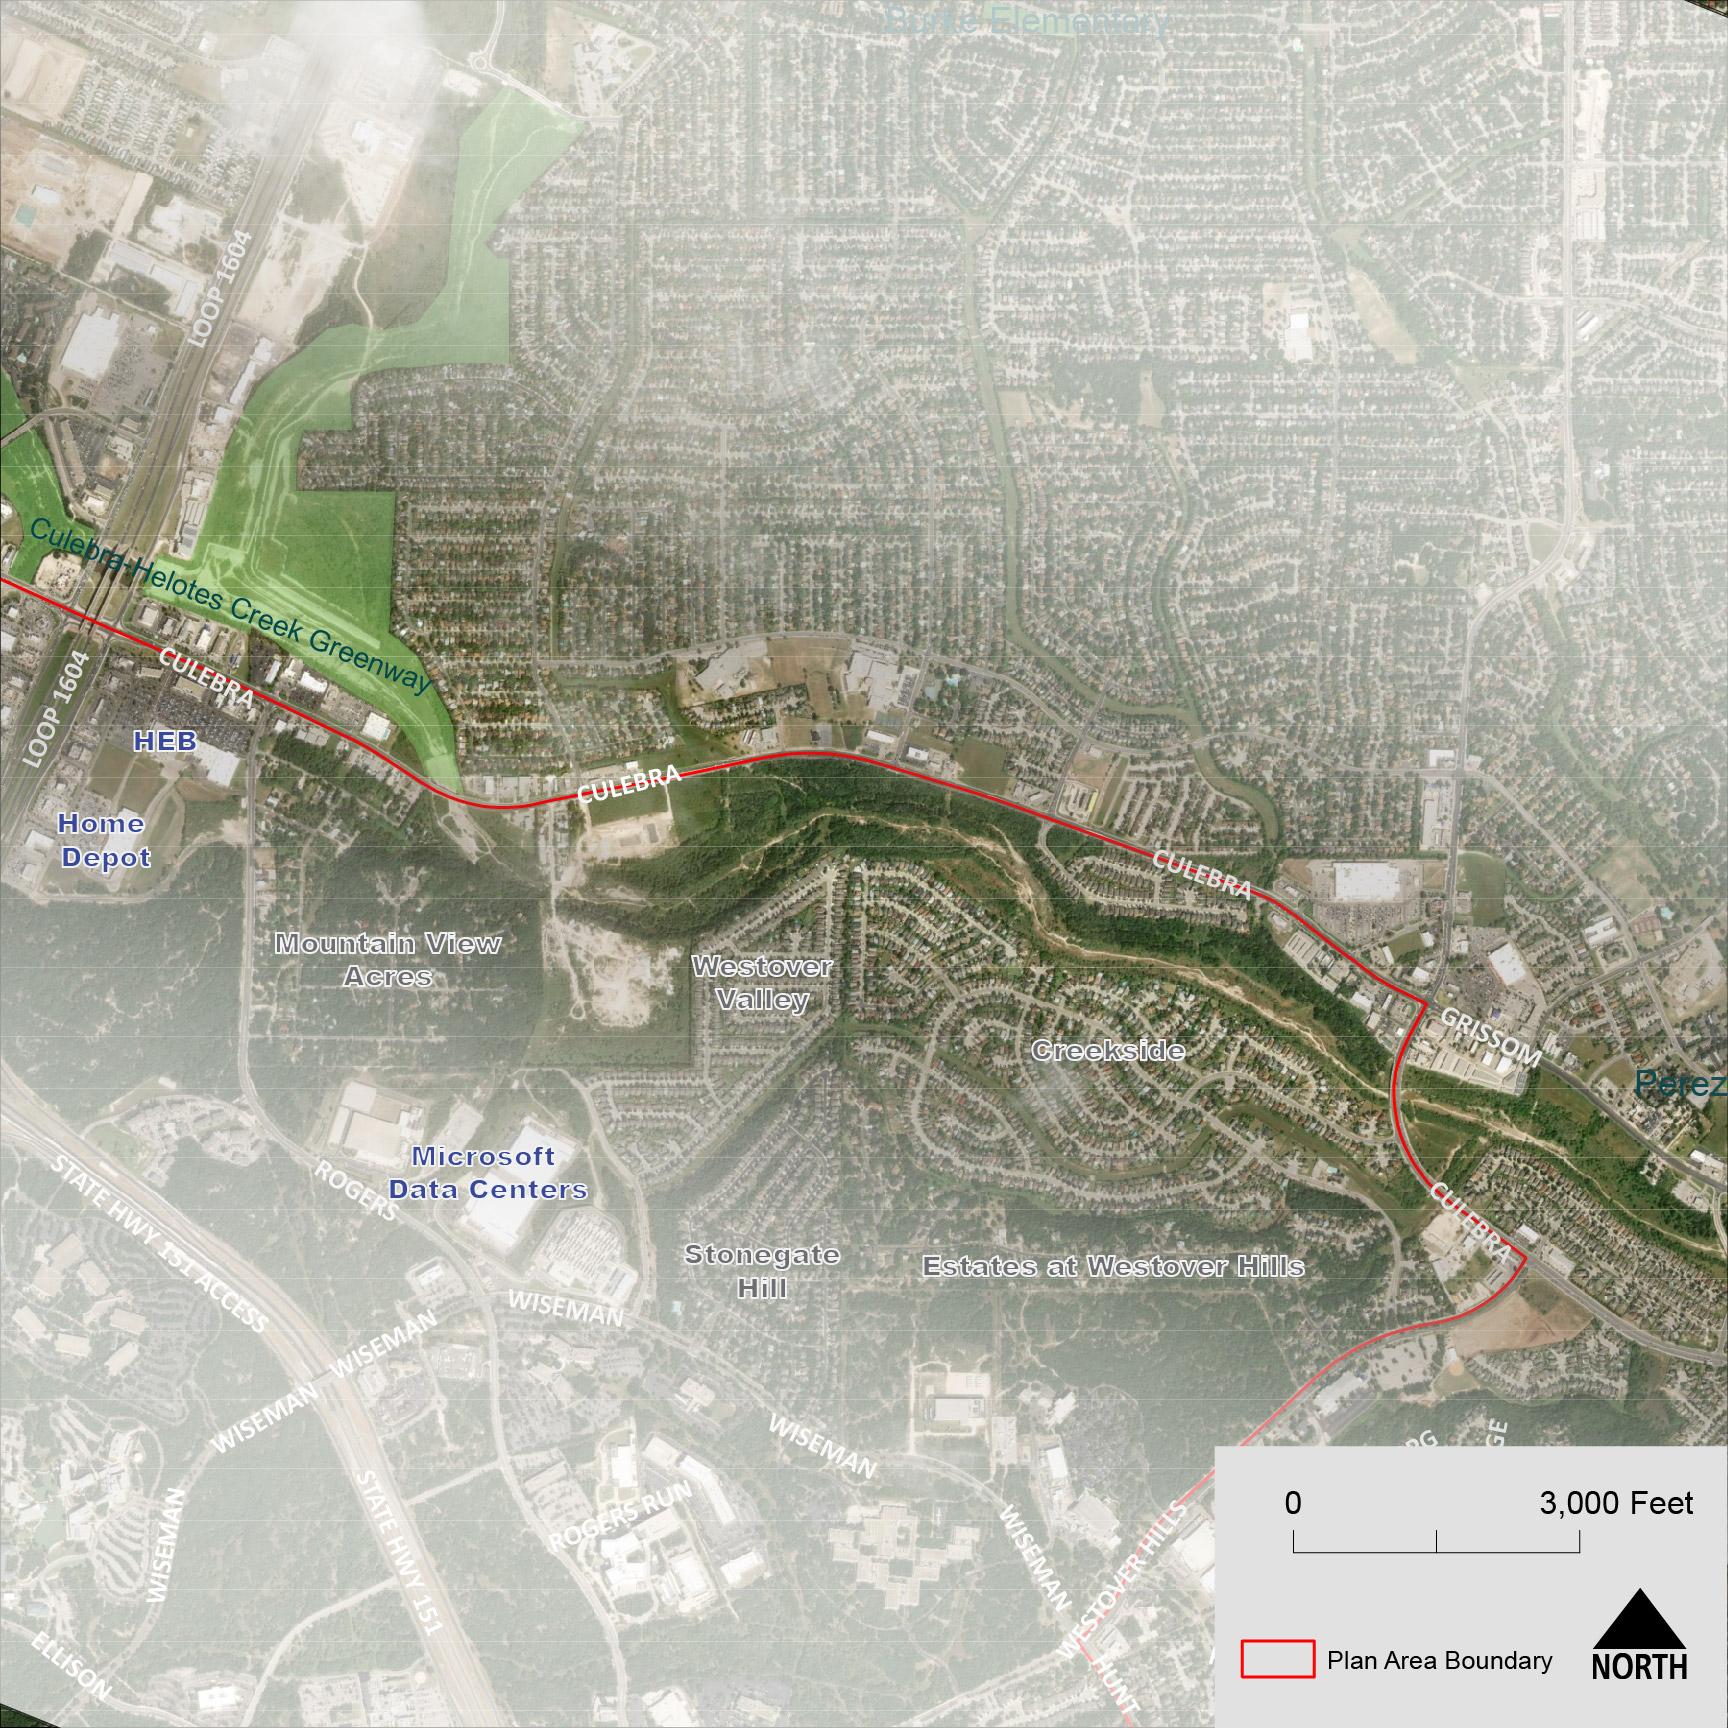 Focus Area #1: Culebra Creek Greenway